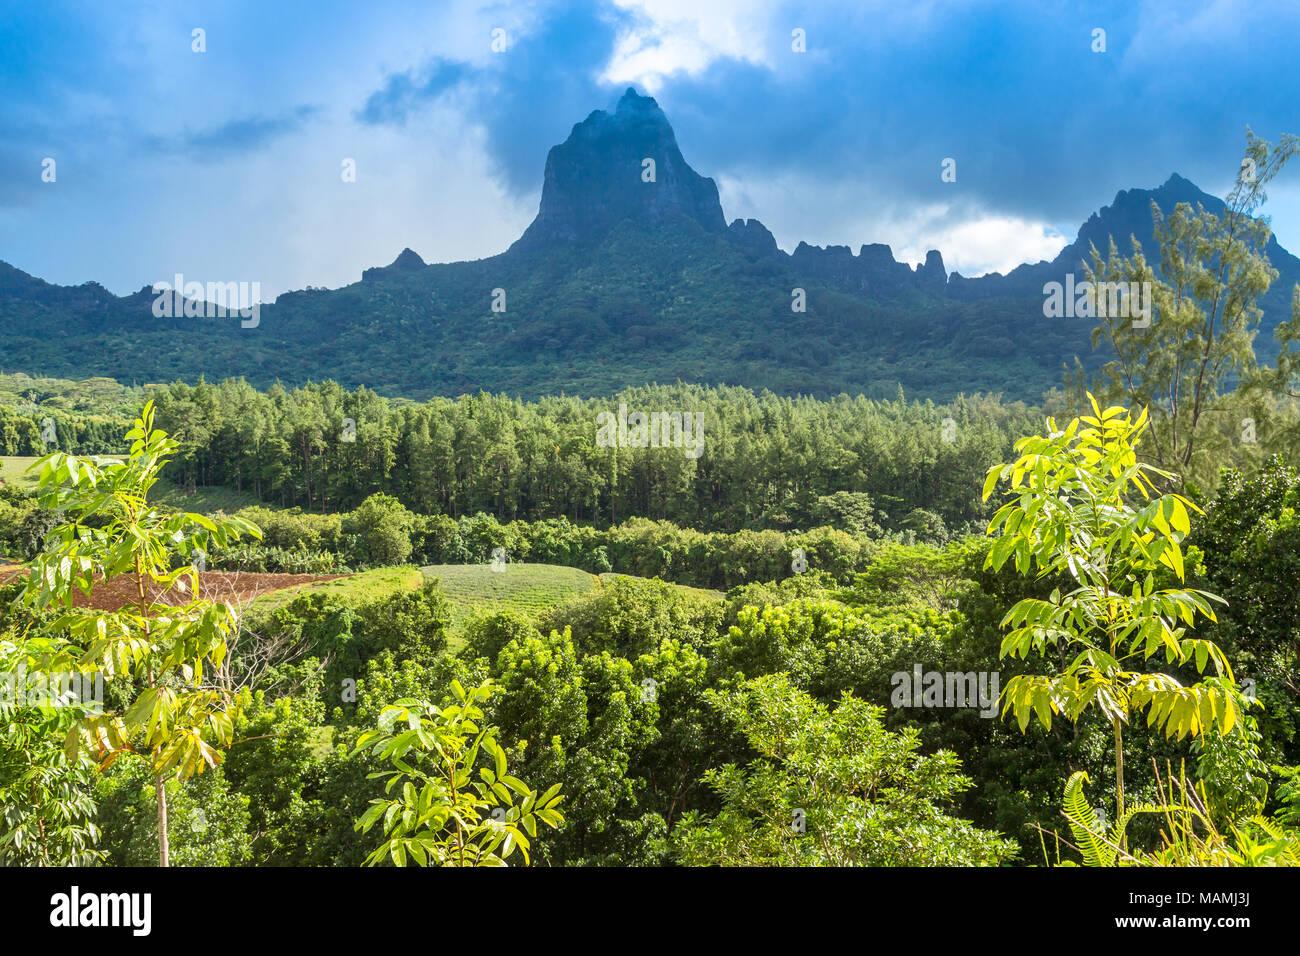 Moorea Island in the French Polynesia. - Stock Image